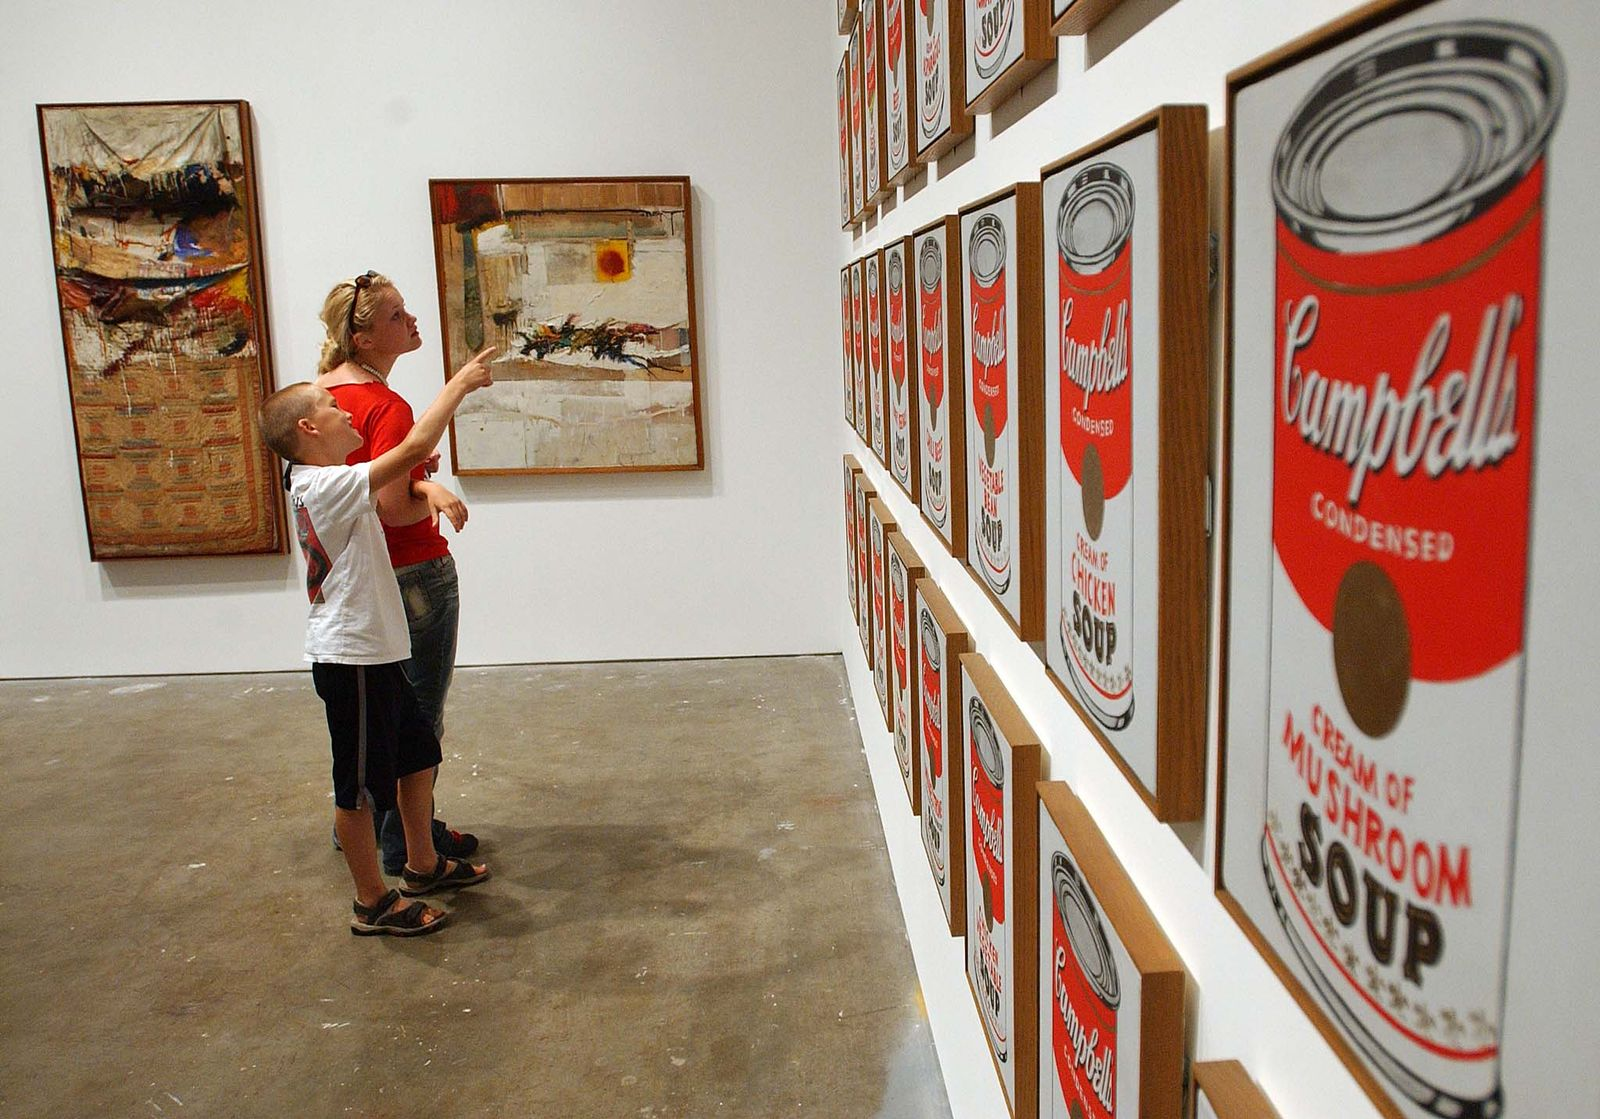 KaSP Warhol Campbell's ART MOMA